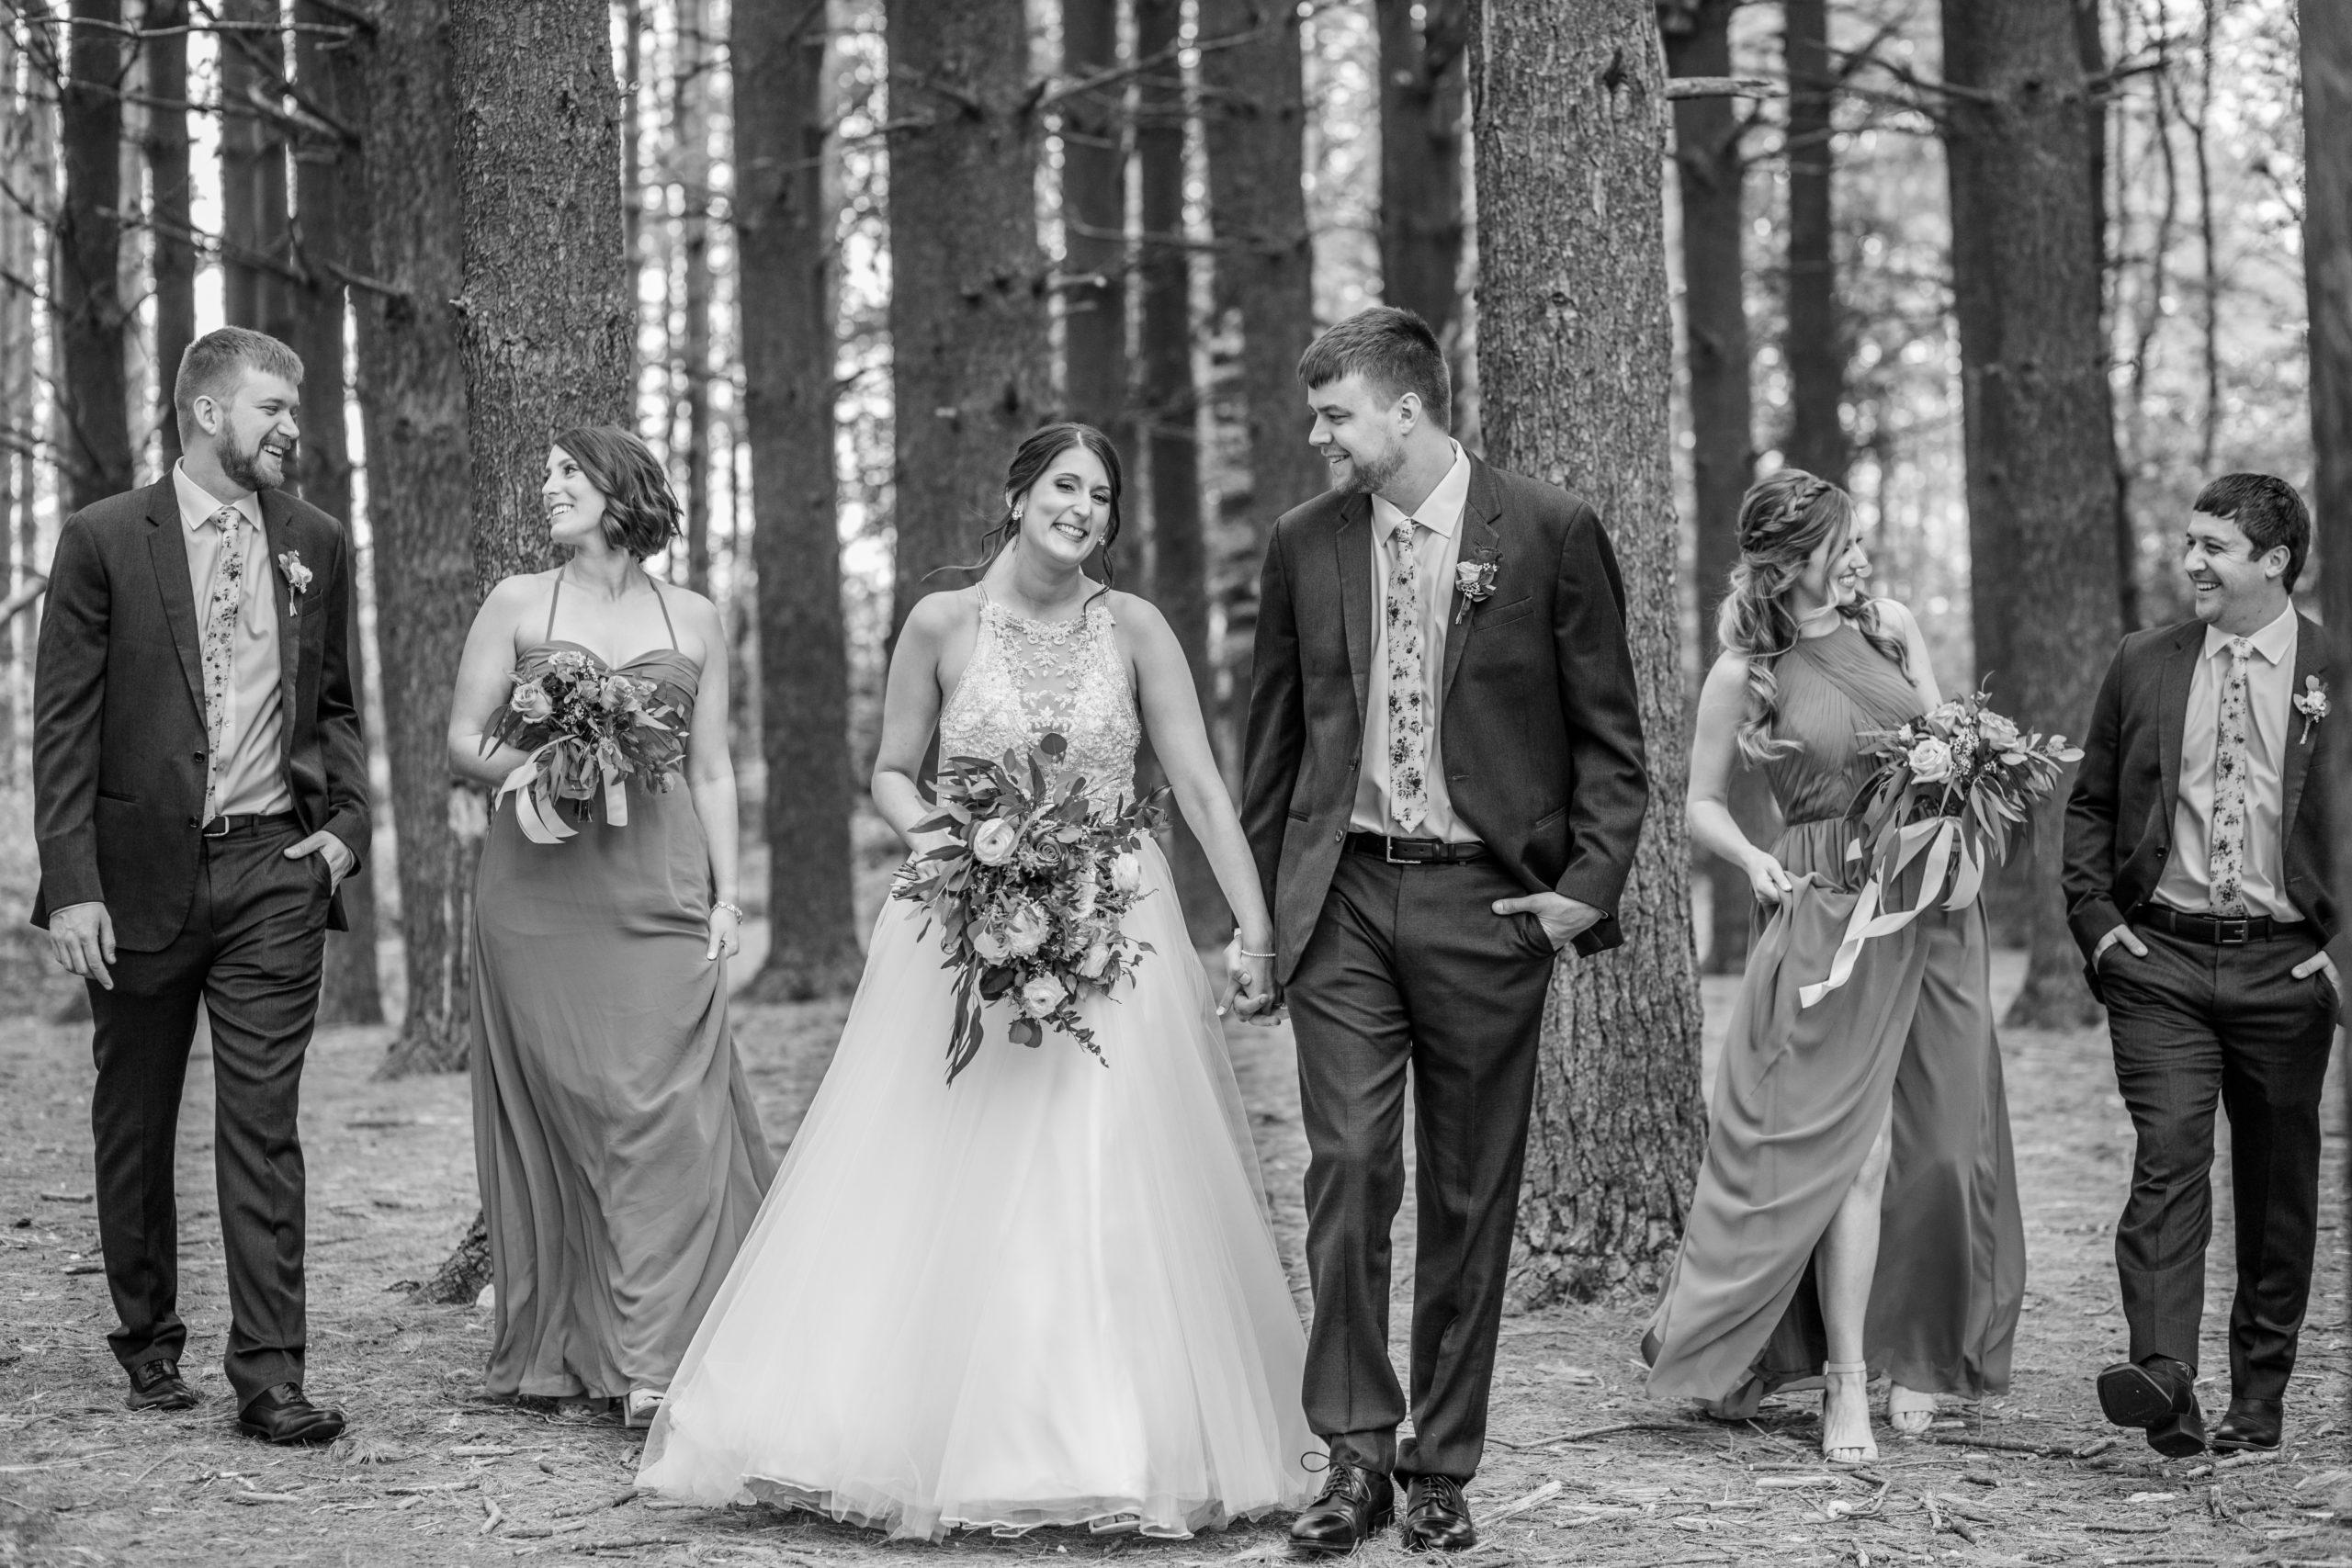 southern illinois photographer Wedding party, pine trees, black and white